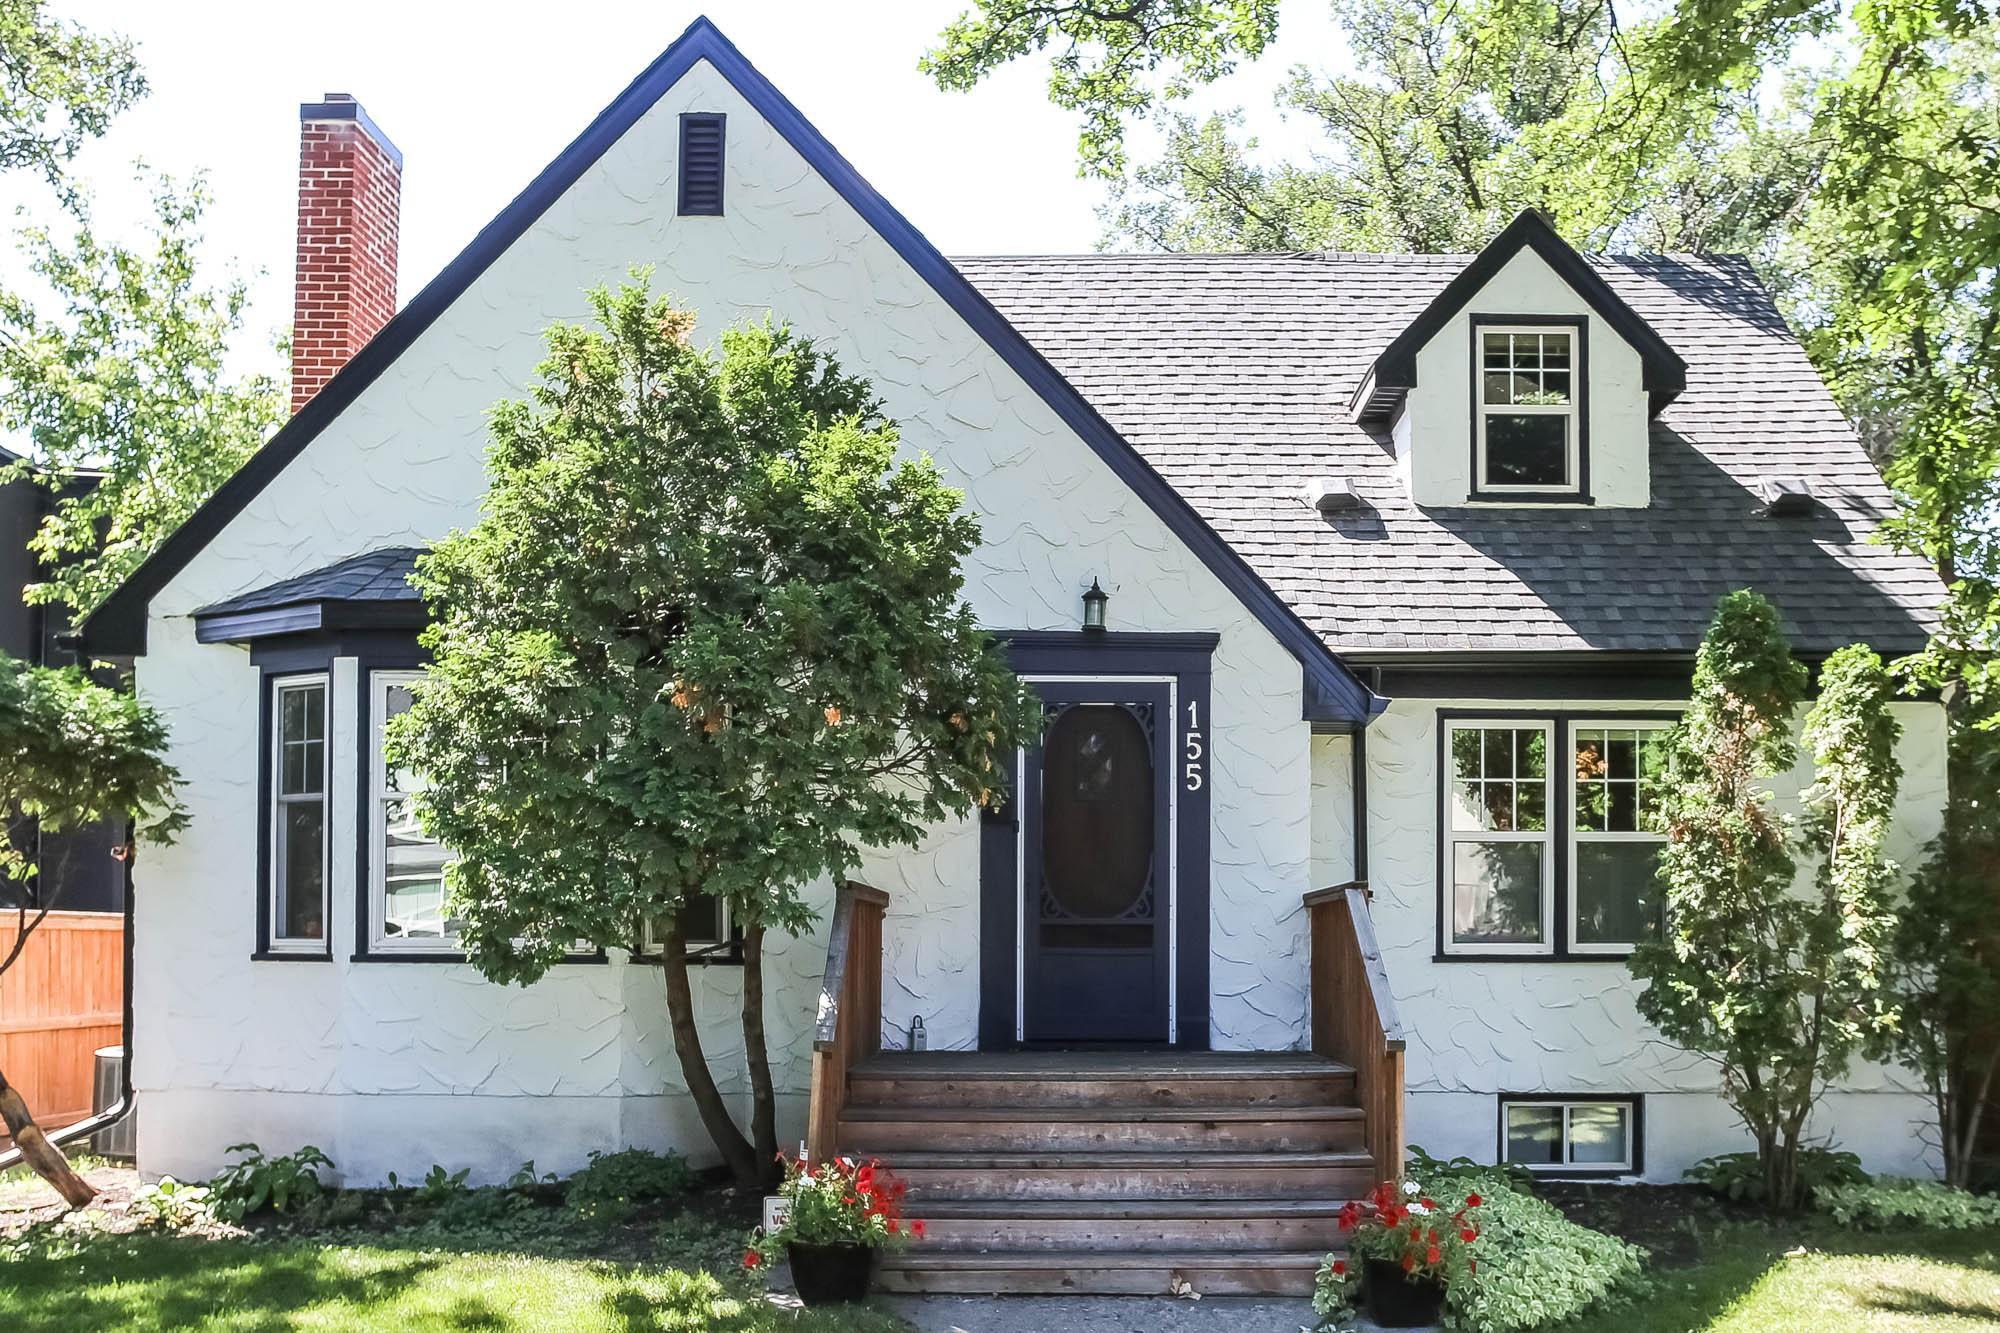 Photo 35: Photos: 155 Borebank Street in Winnipeg: River Heights Single Family Detached for sale (1C)  : MLS®# 202017166